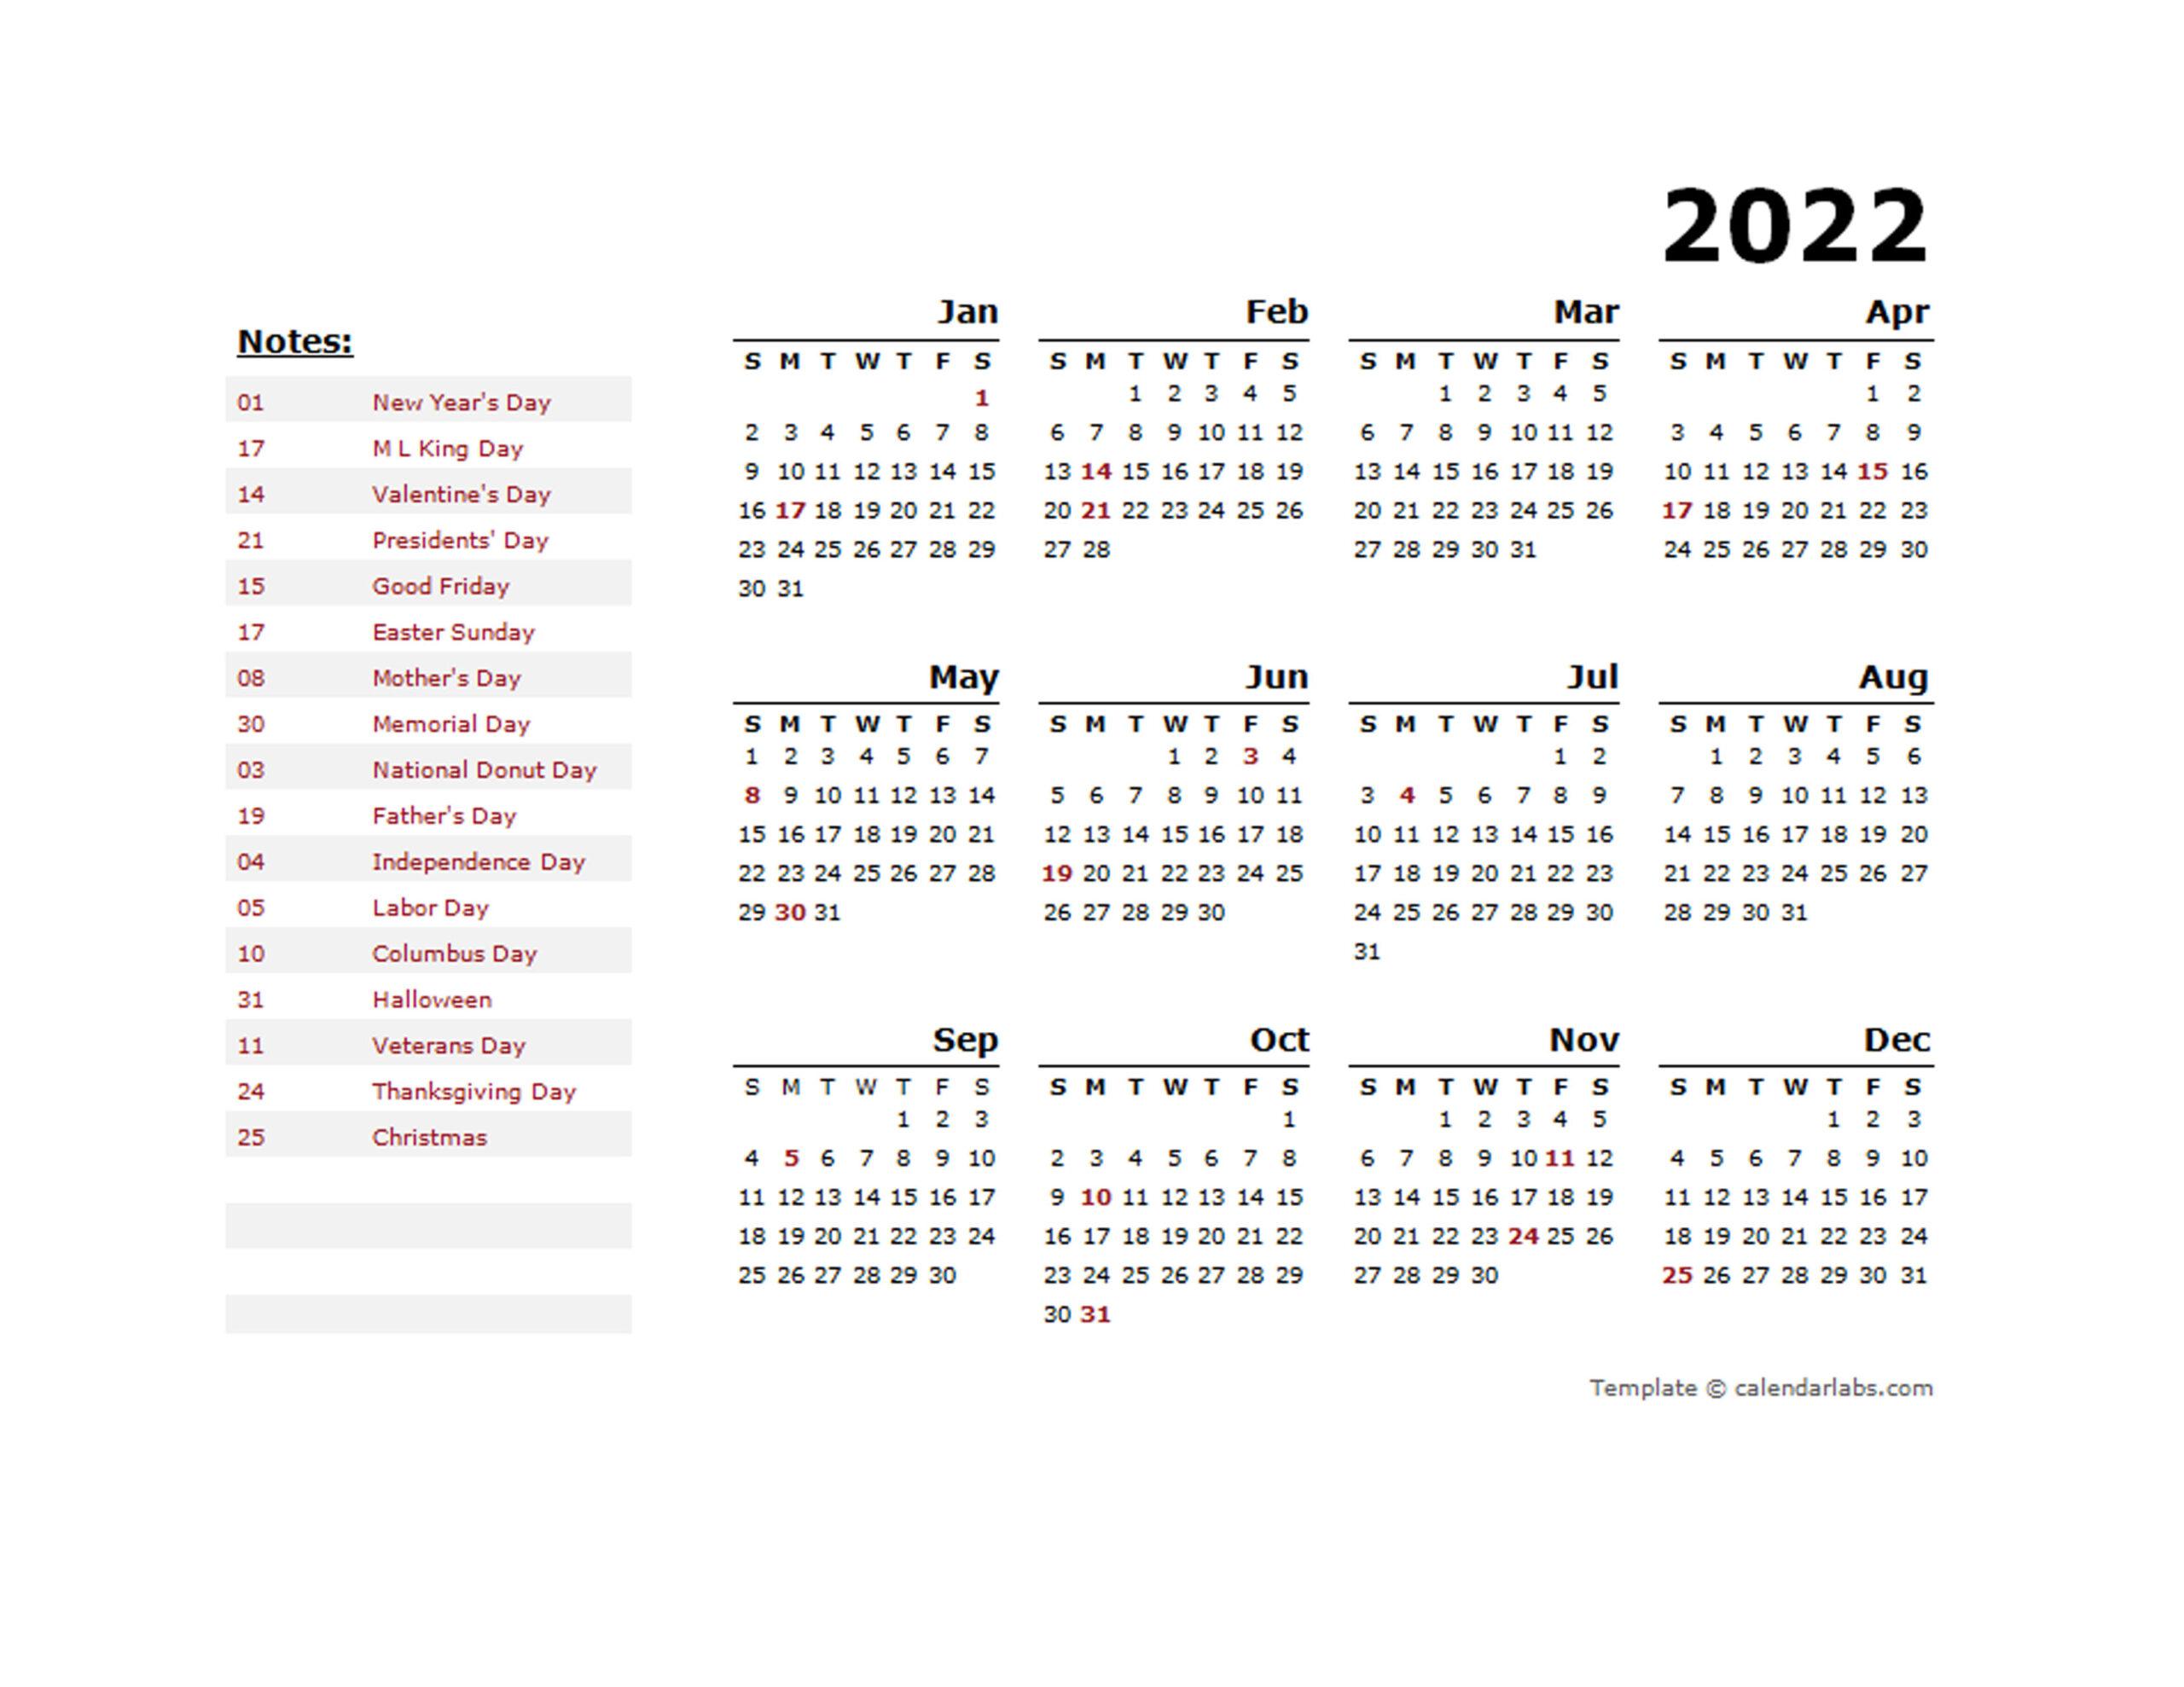 2022 Calendar Year View